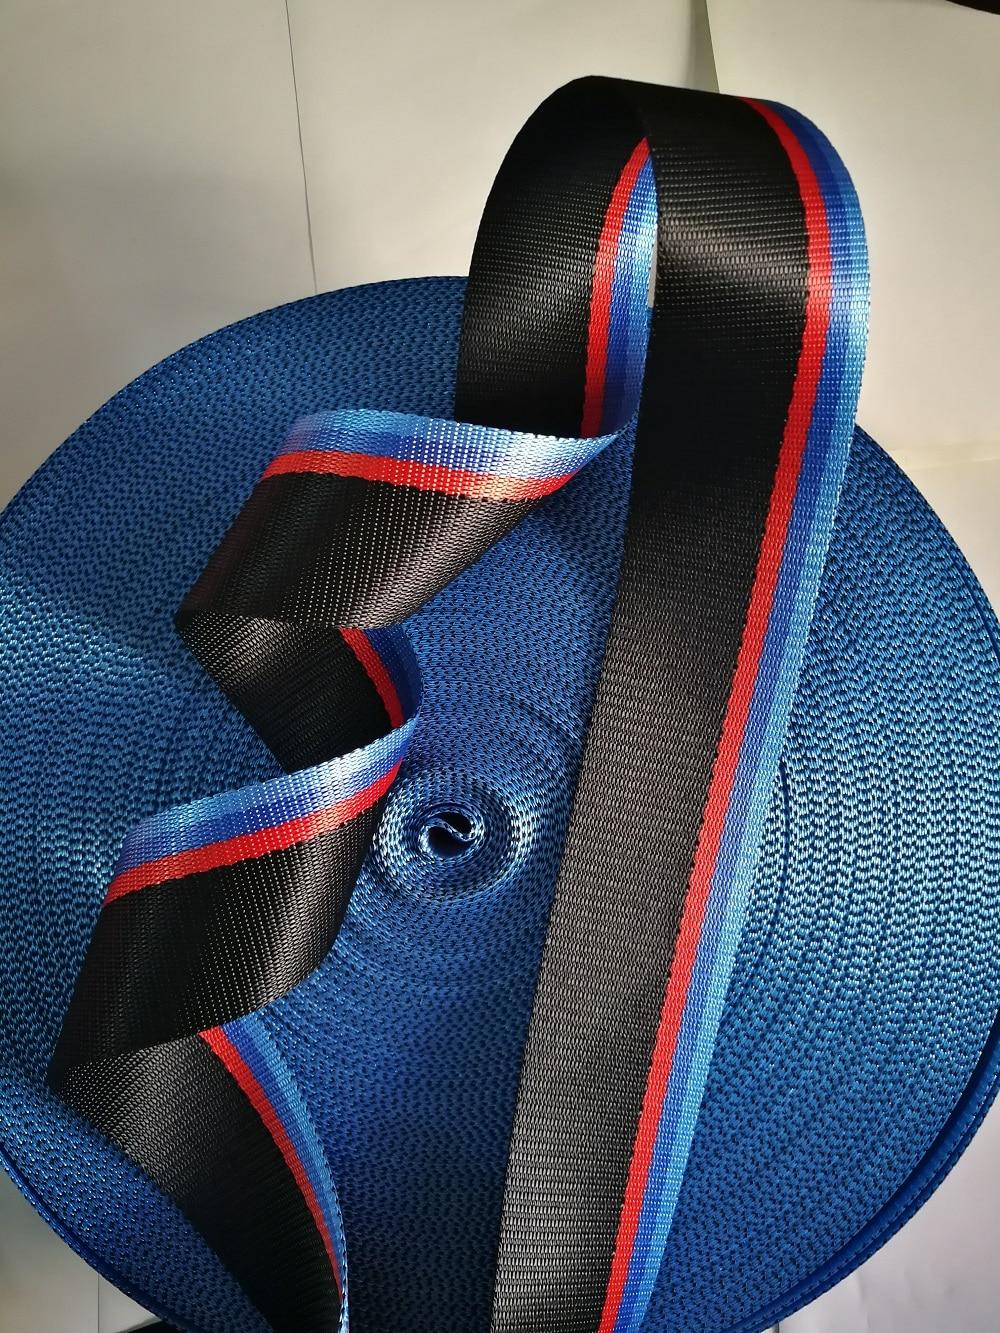 3M-30M Multicolor Car Seat Belt Webbing European Standard Car Personalized Modification Seat Belt Webbing For Bmw Accessories